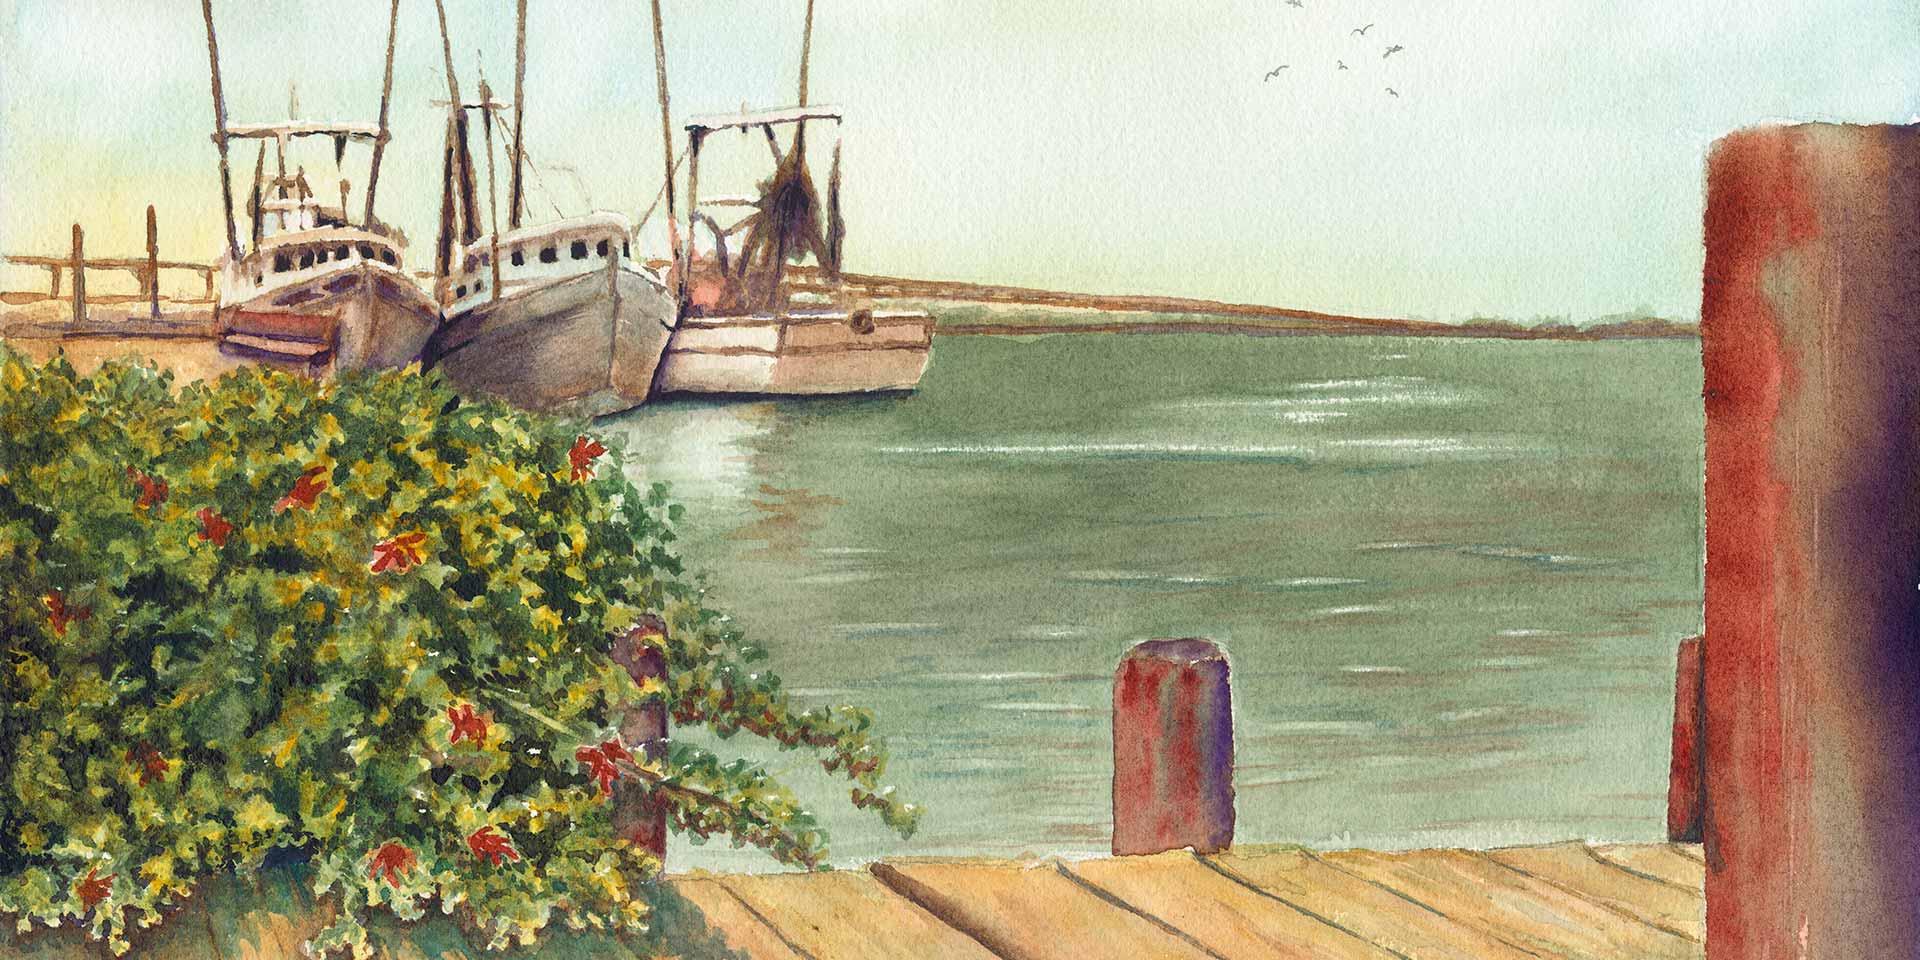 Ladies a' Waiting, Watercolor by Linda Eddins